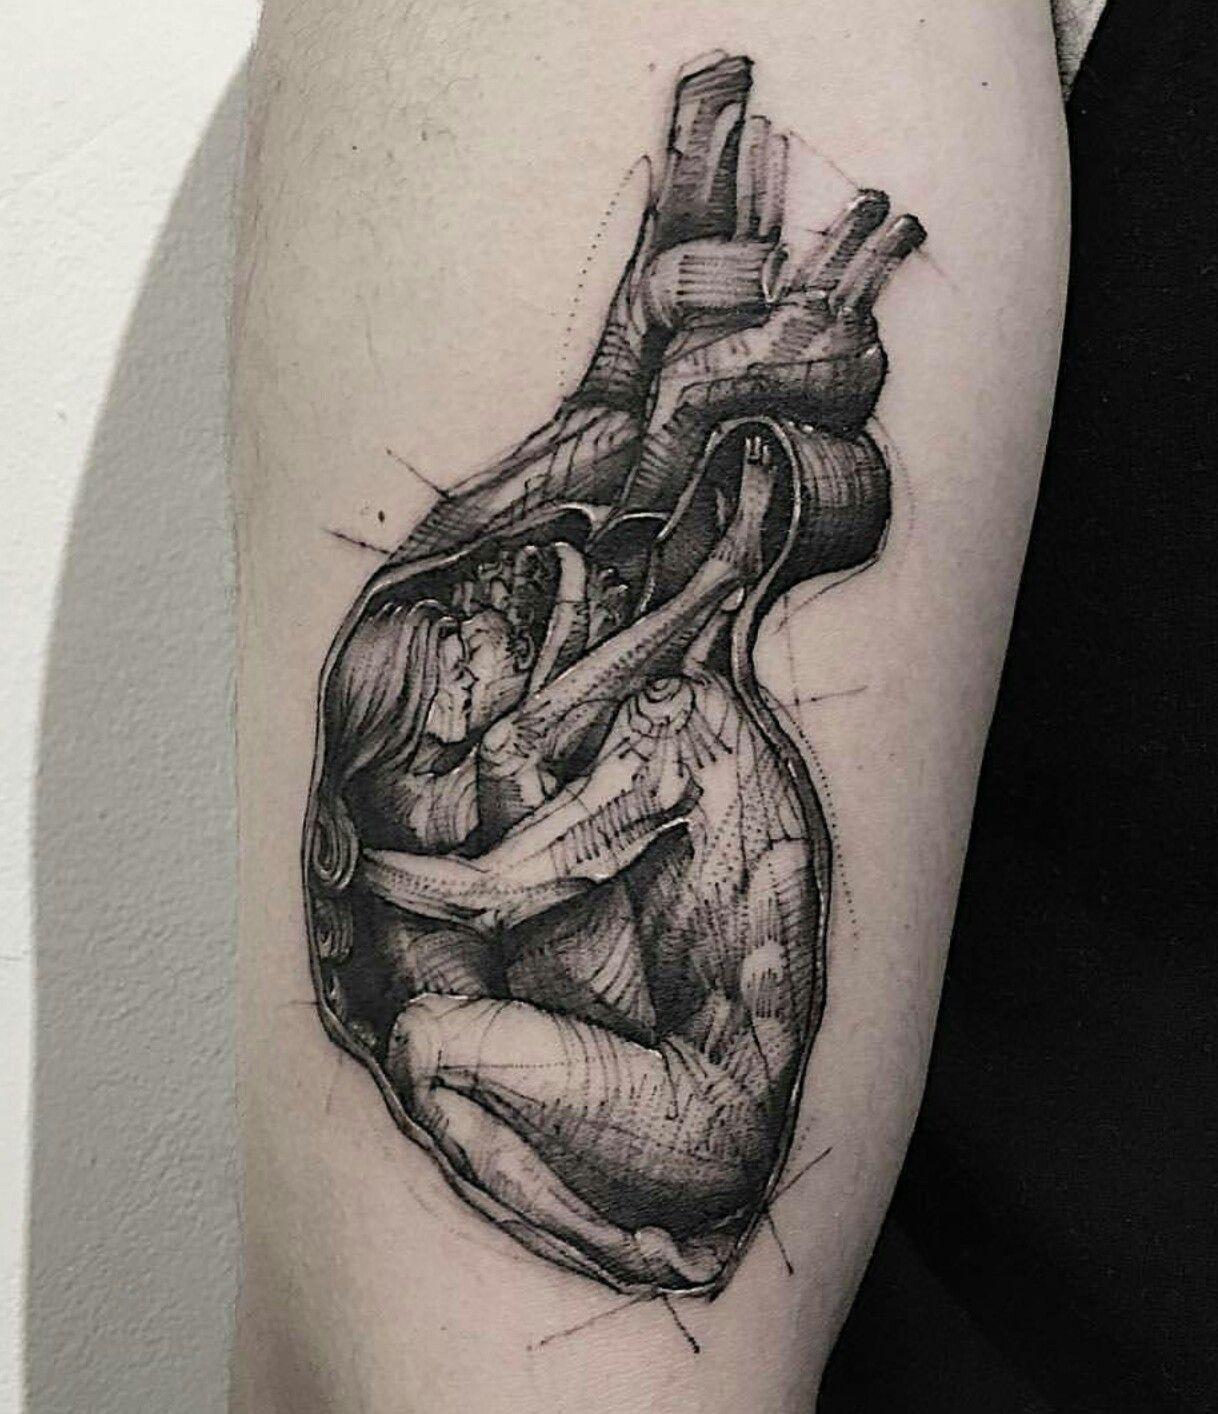 Pin By Jen Duffy On Tattoos: Pin Di Jennifer Guedes Su Tattoo